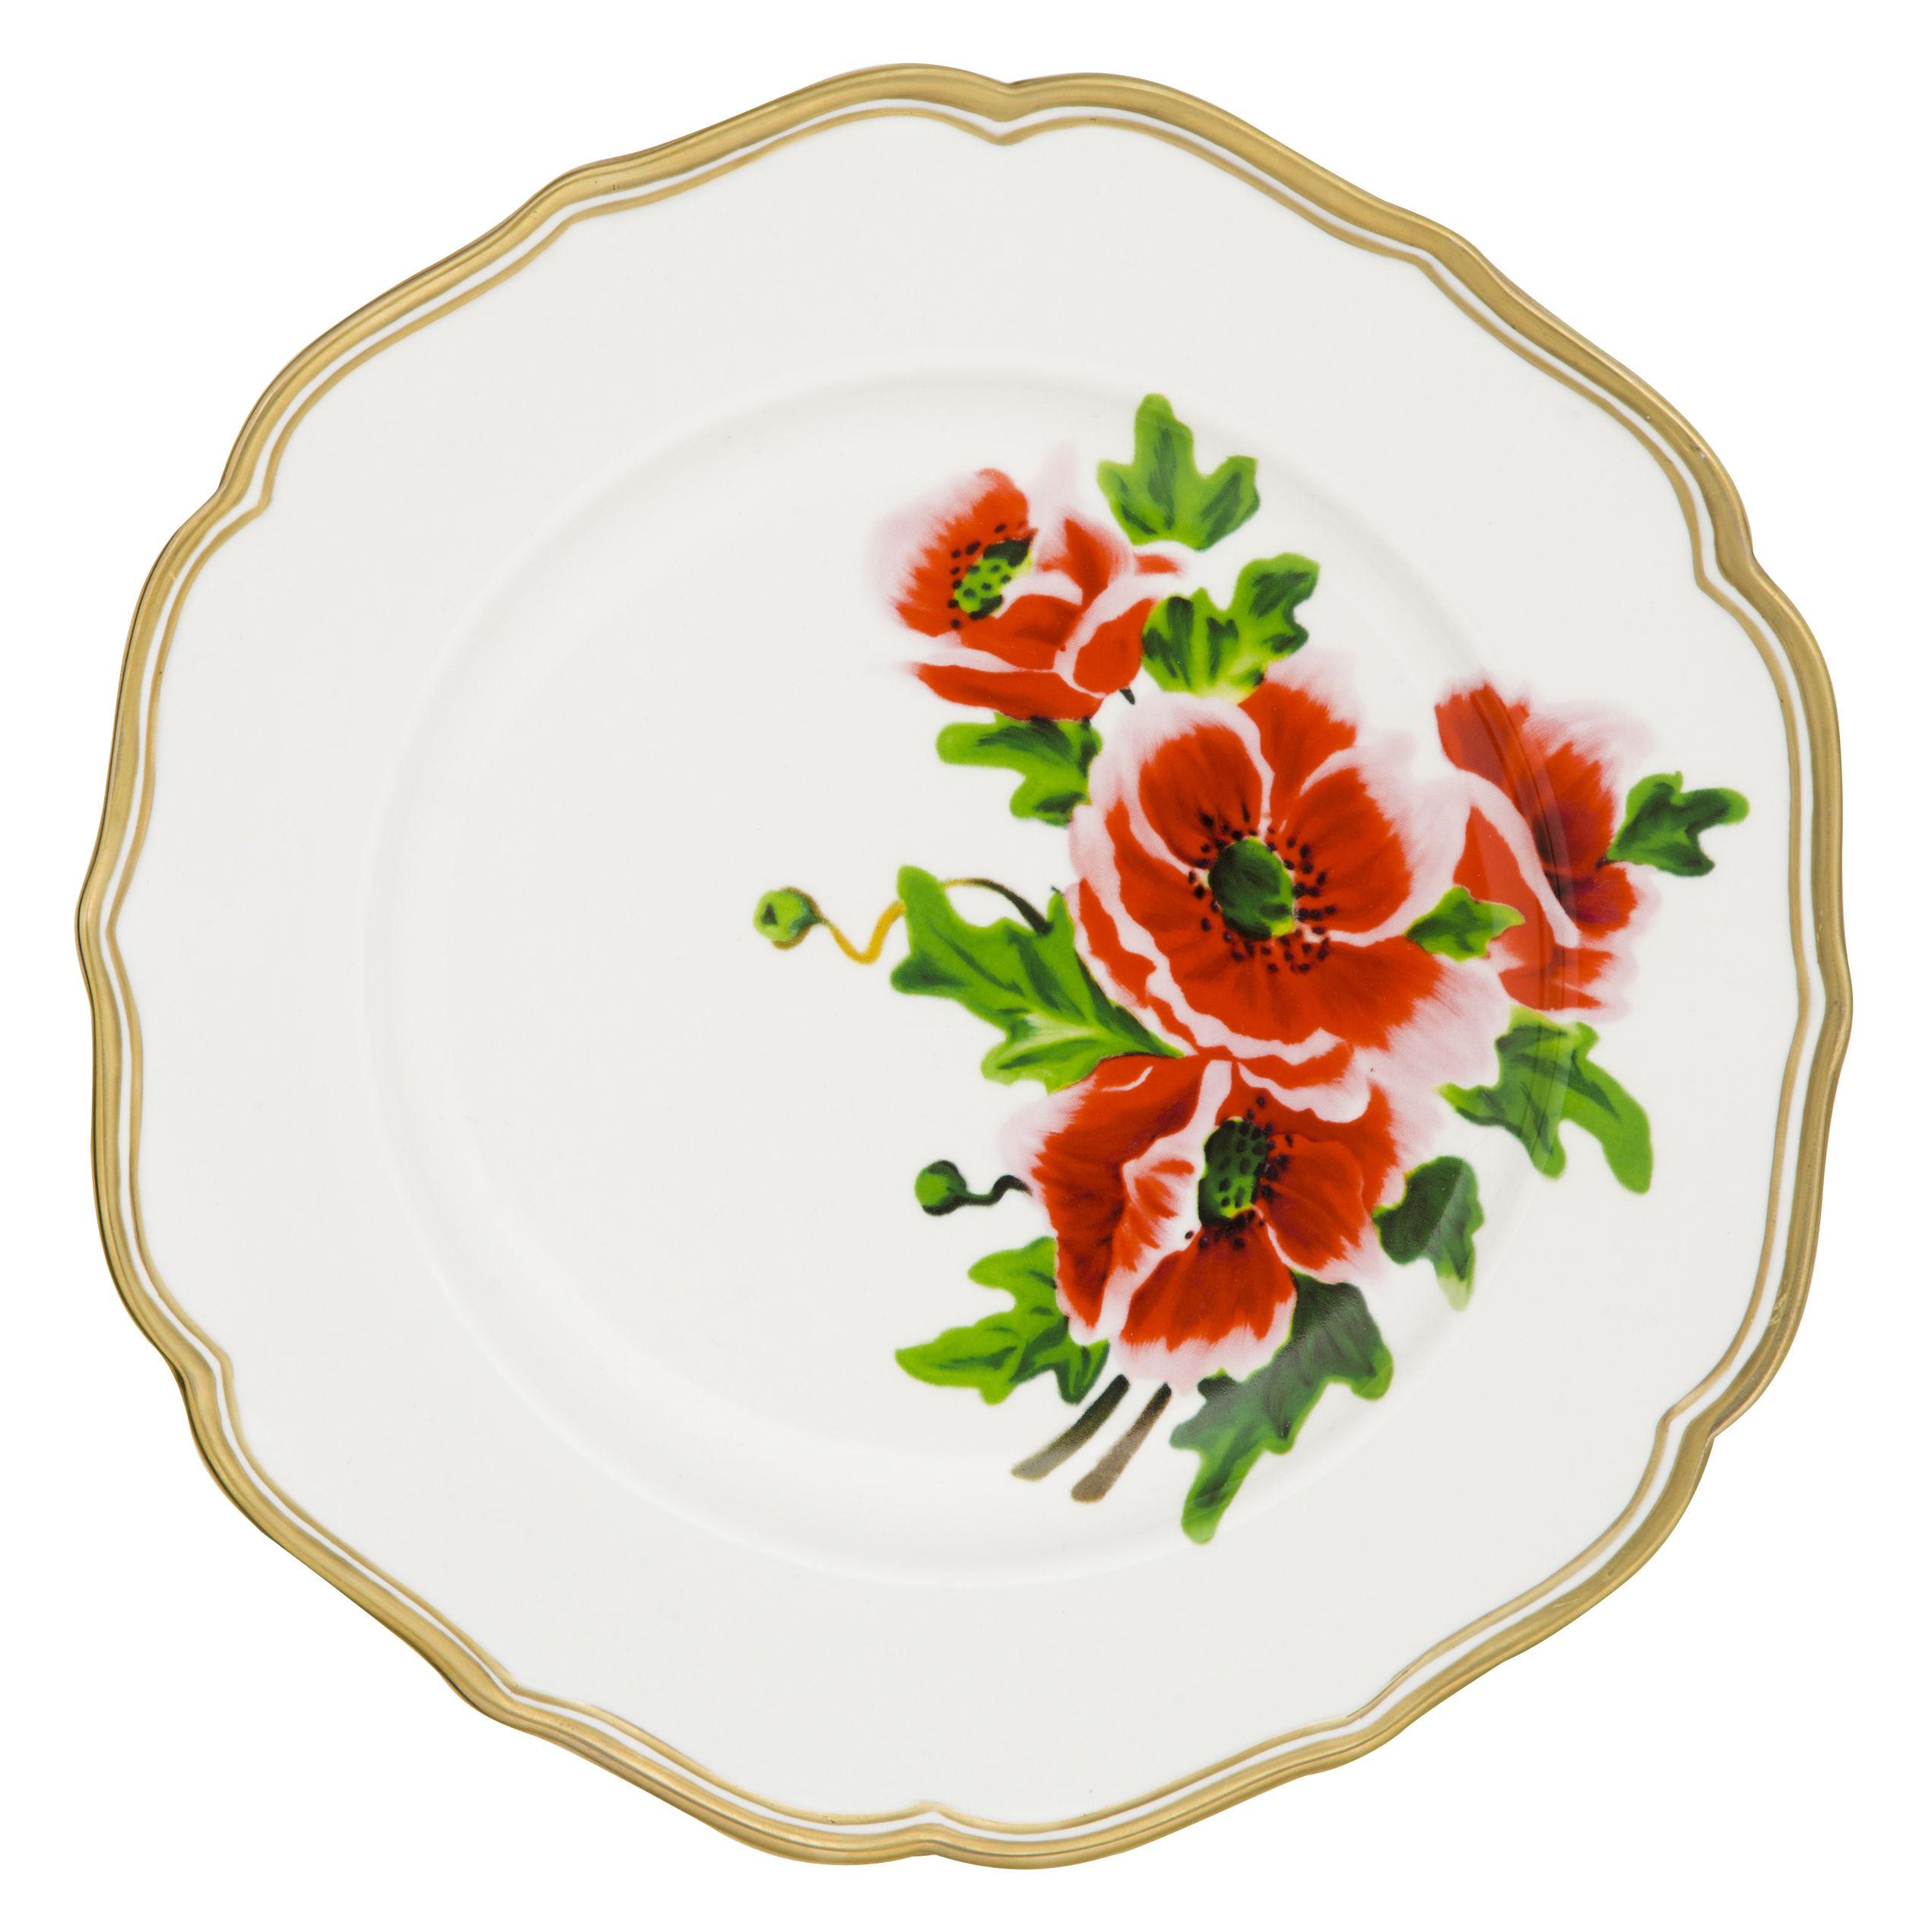 Tischkultur - Teller - Fiore francese Teller / Ø 27 cm - Bitossi Home - Blumen - Porzellan